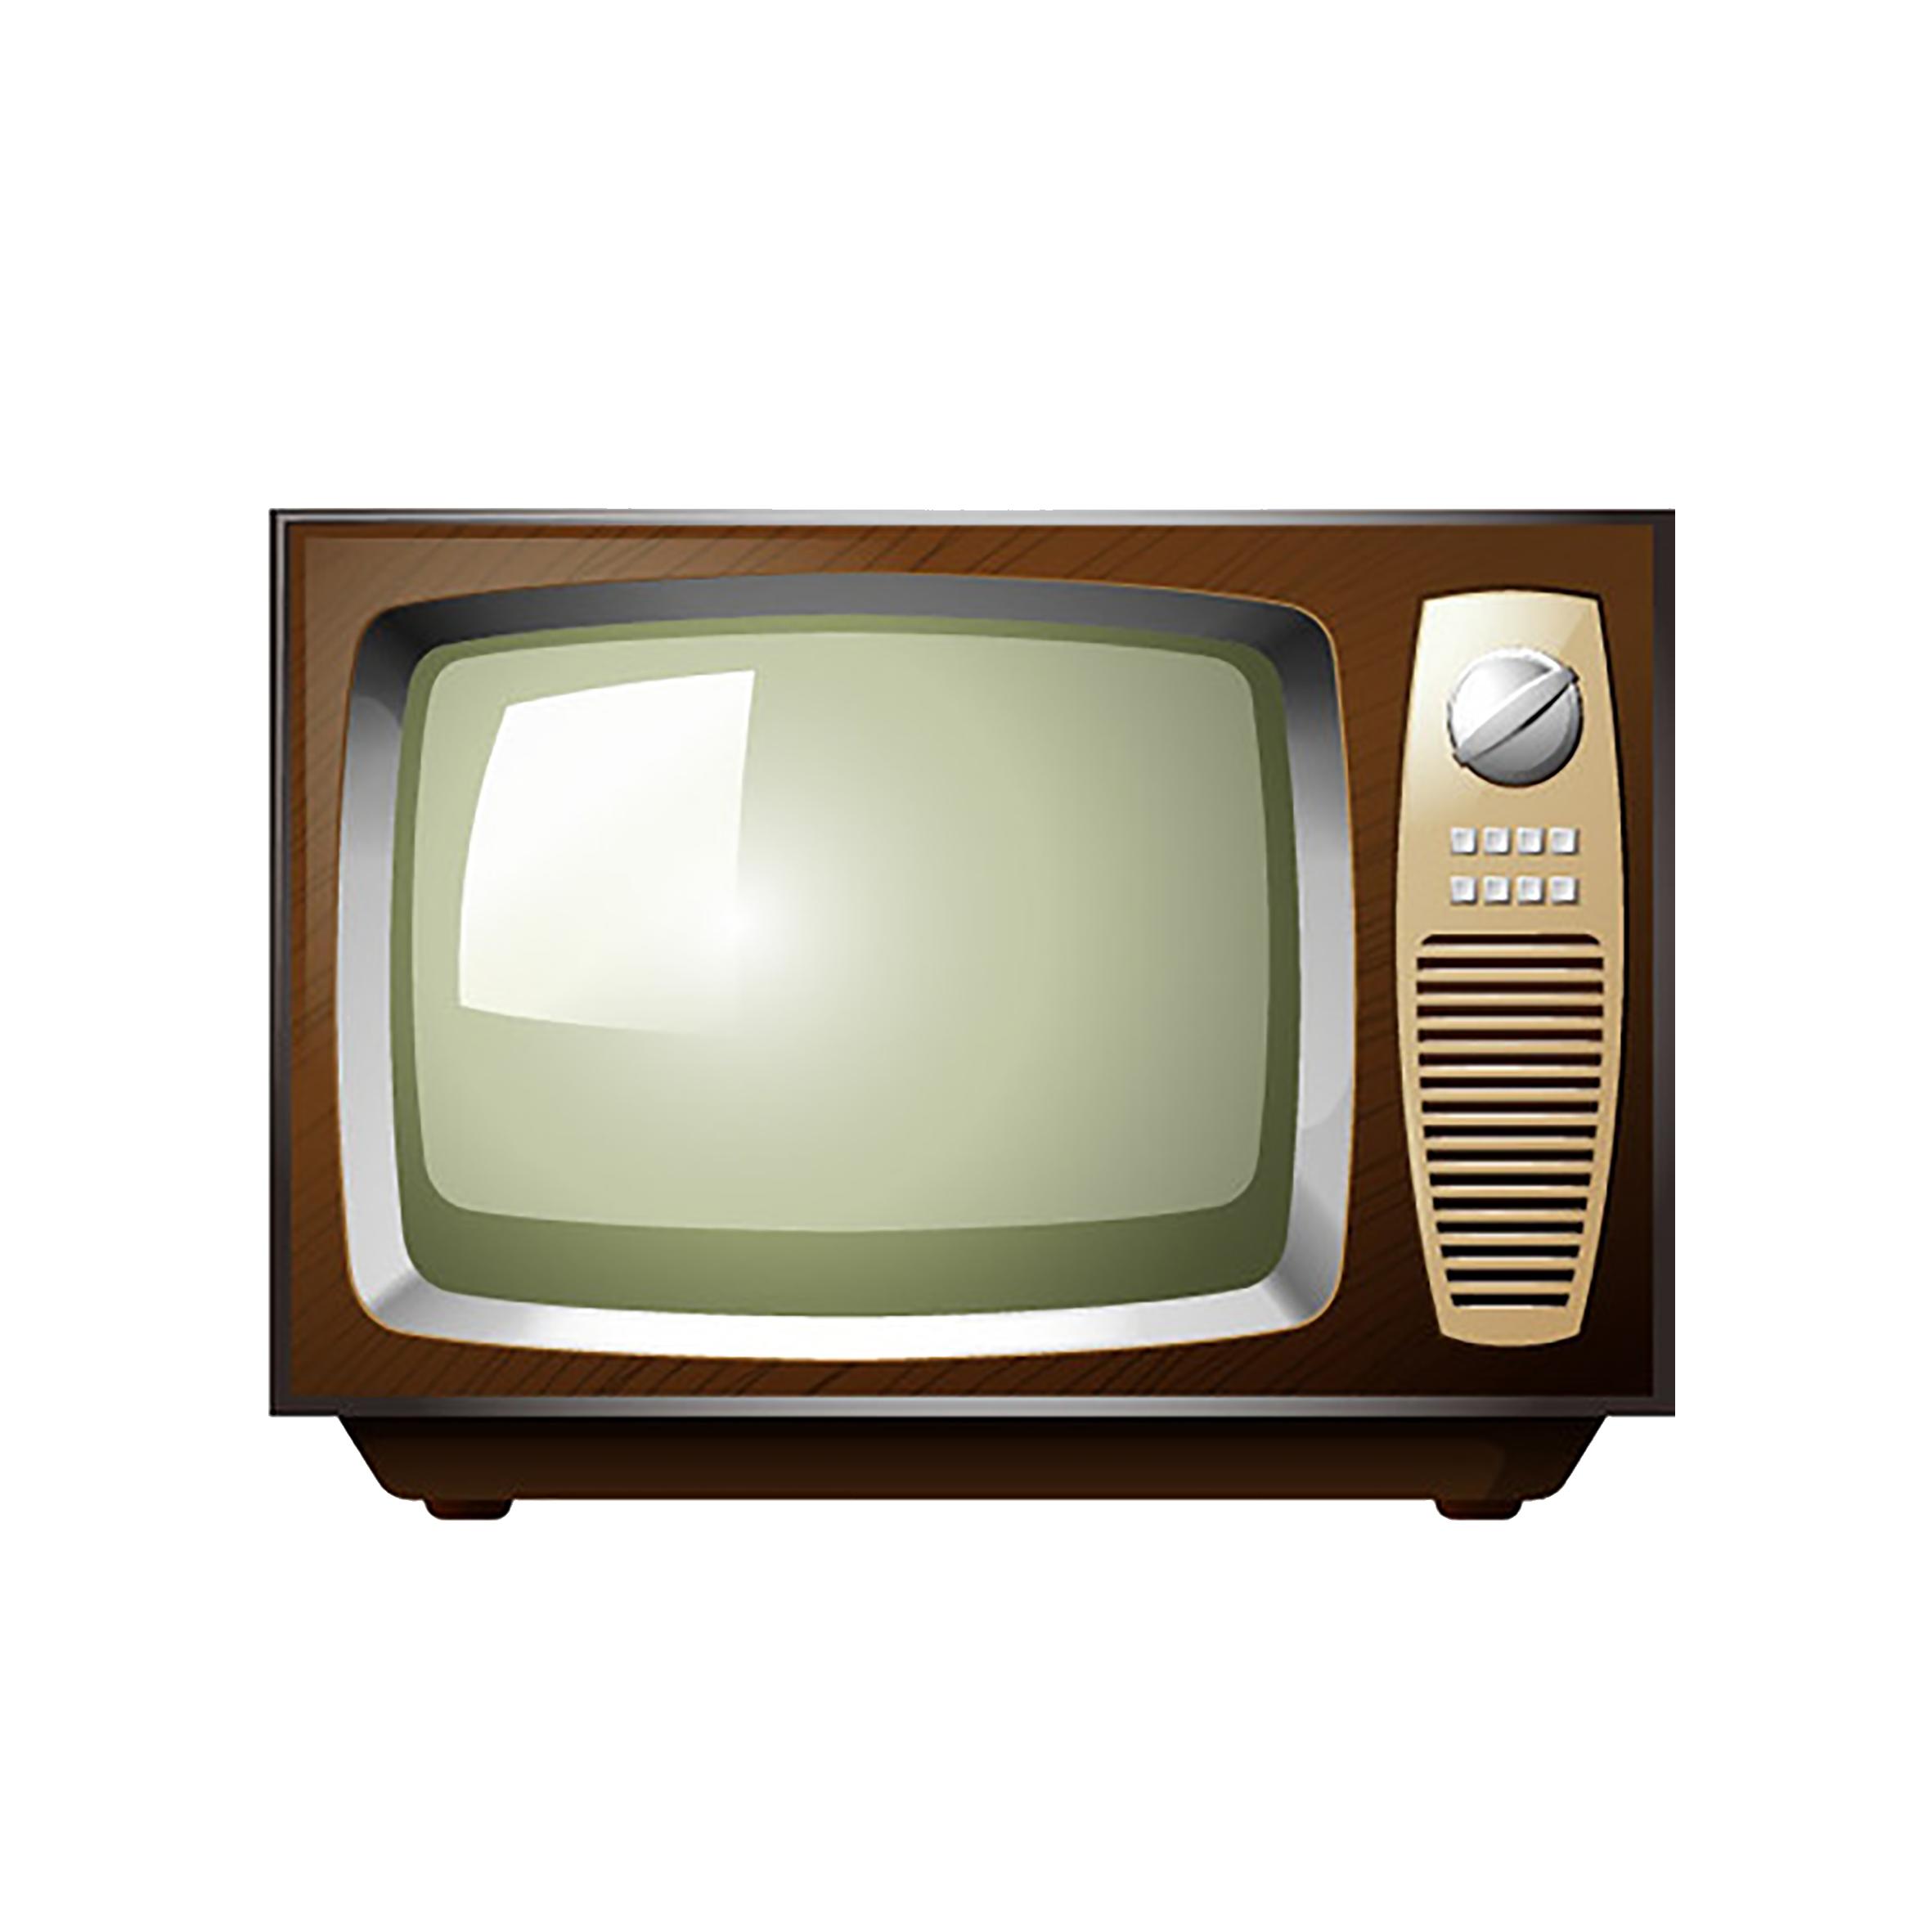 Television Stock illustration.